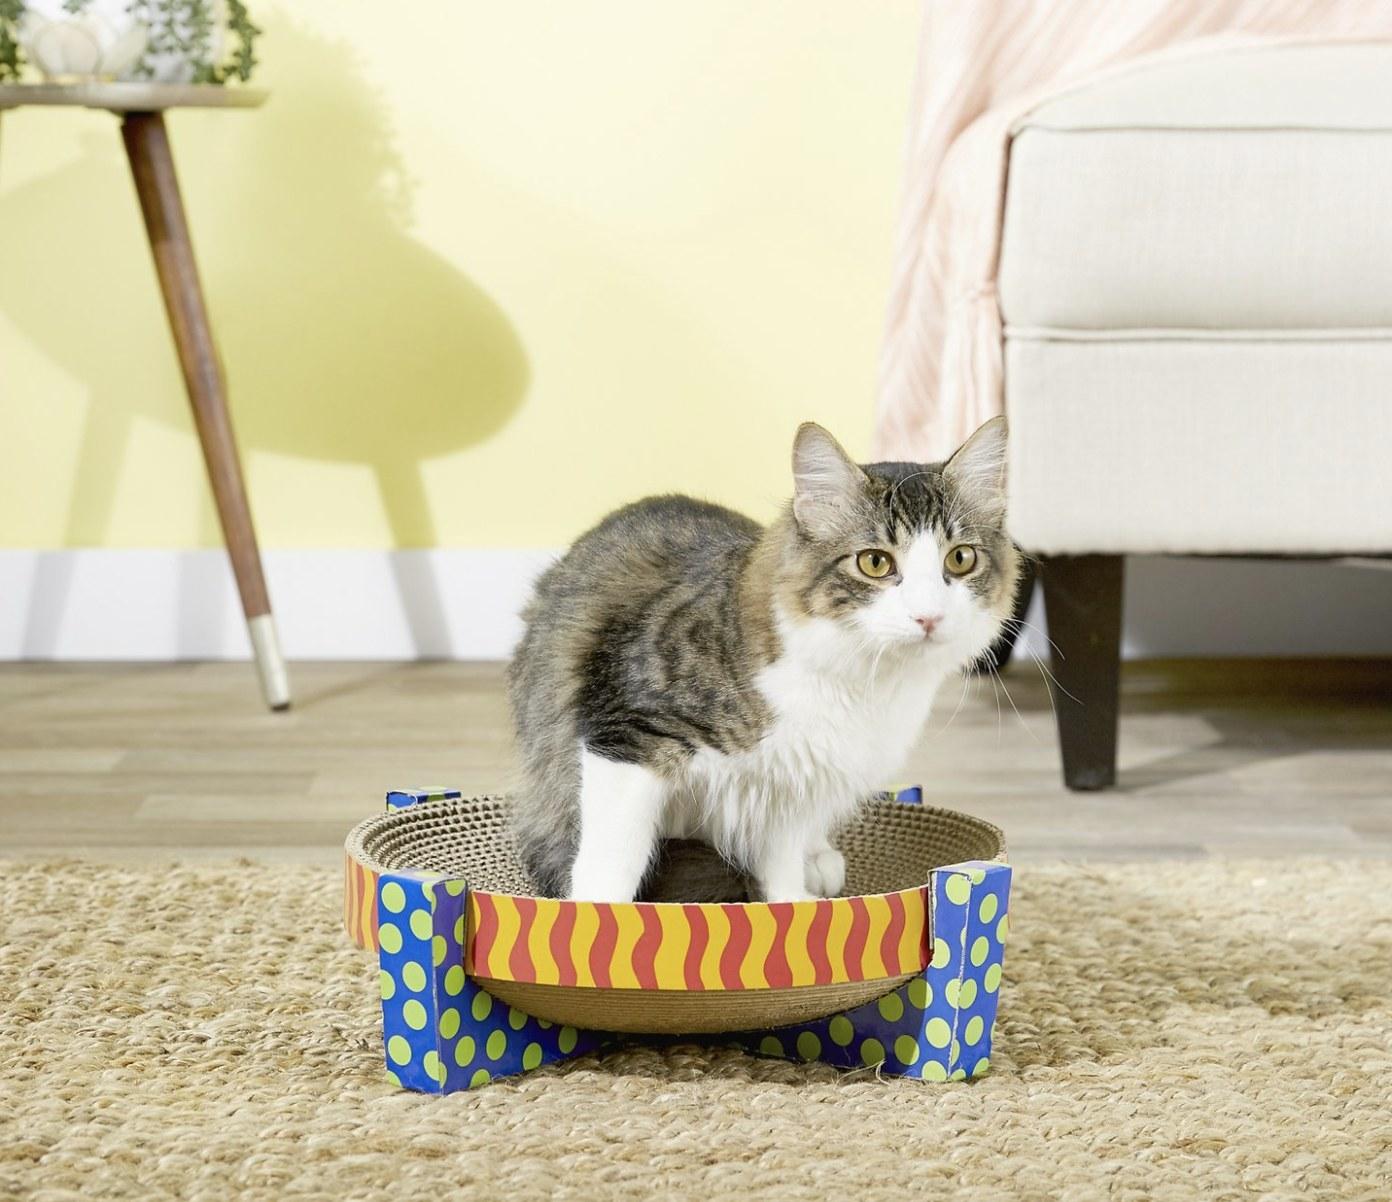 A cat sitting on a cat scratcher shaped like a bowl